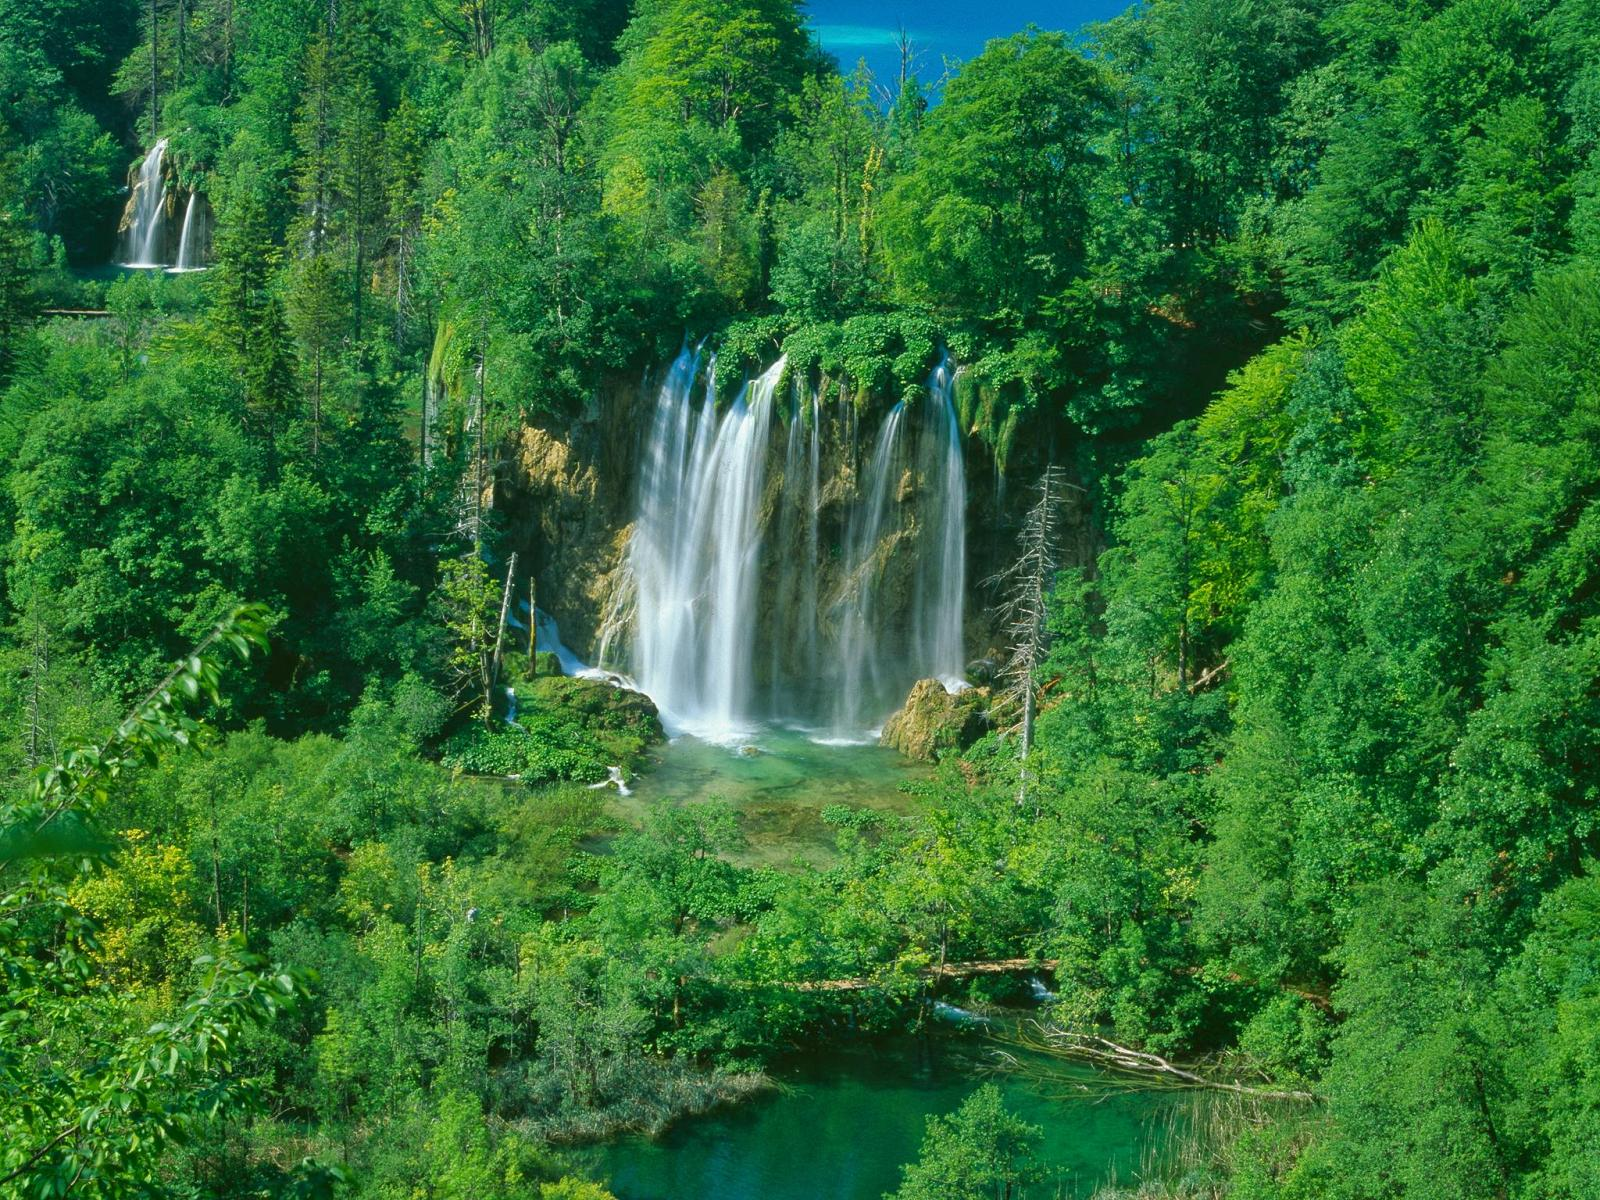 UVODNO PREDAVANJE UŽIVO  o Transcendentalnoj meditaciji u Zagrebu Zeleni trg 2